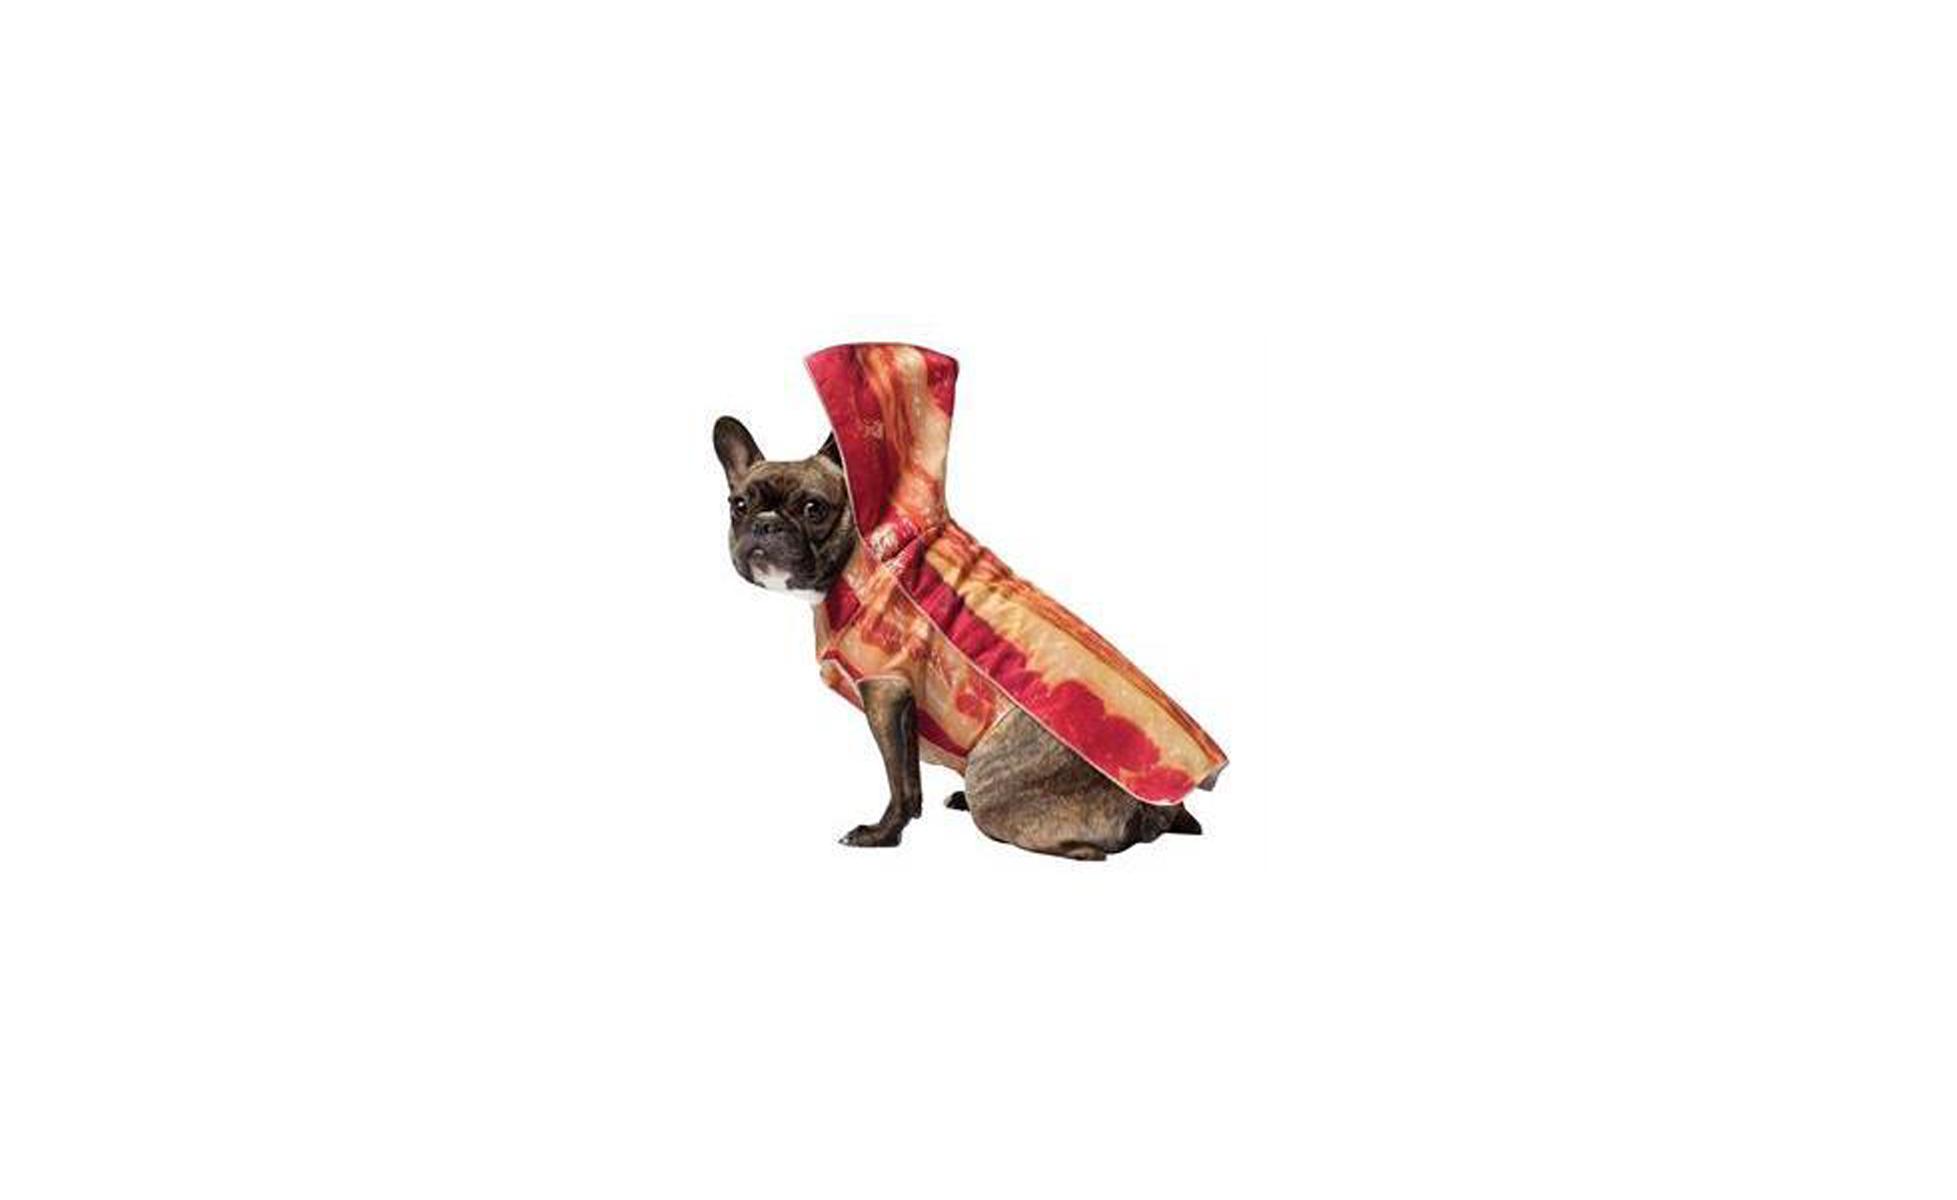 Bacon Dog Costume at Jet.com